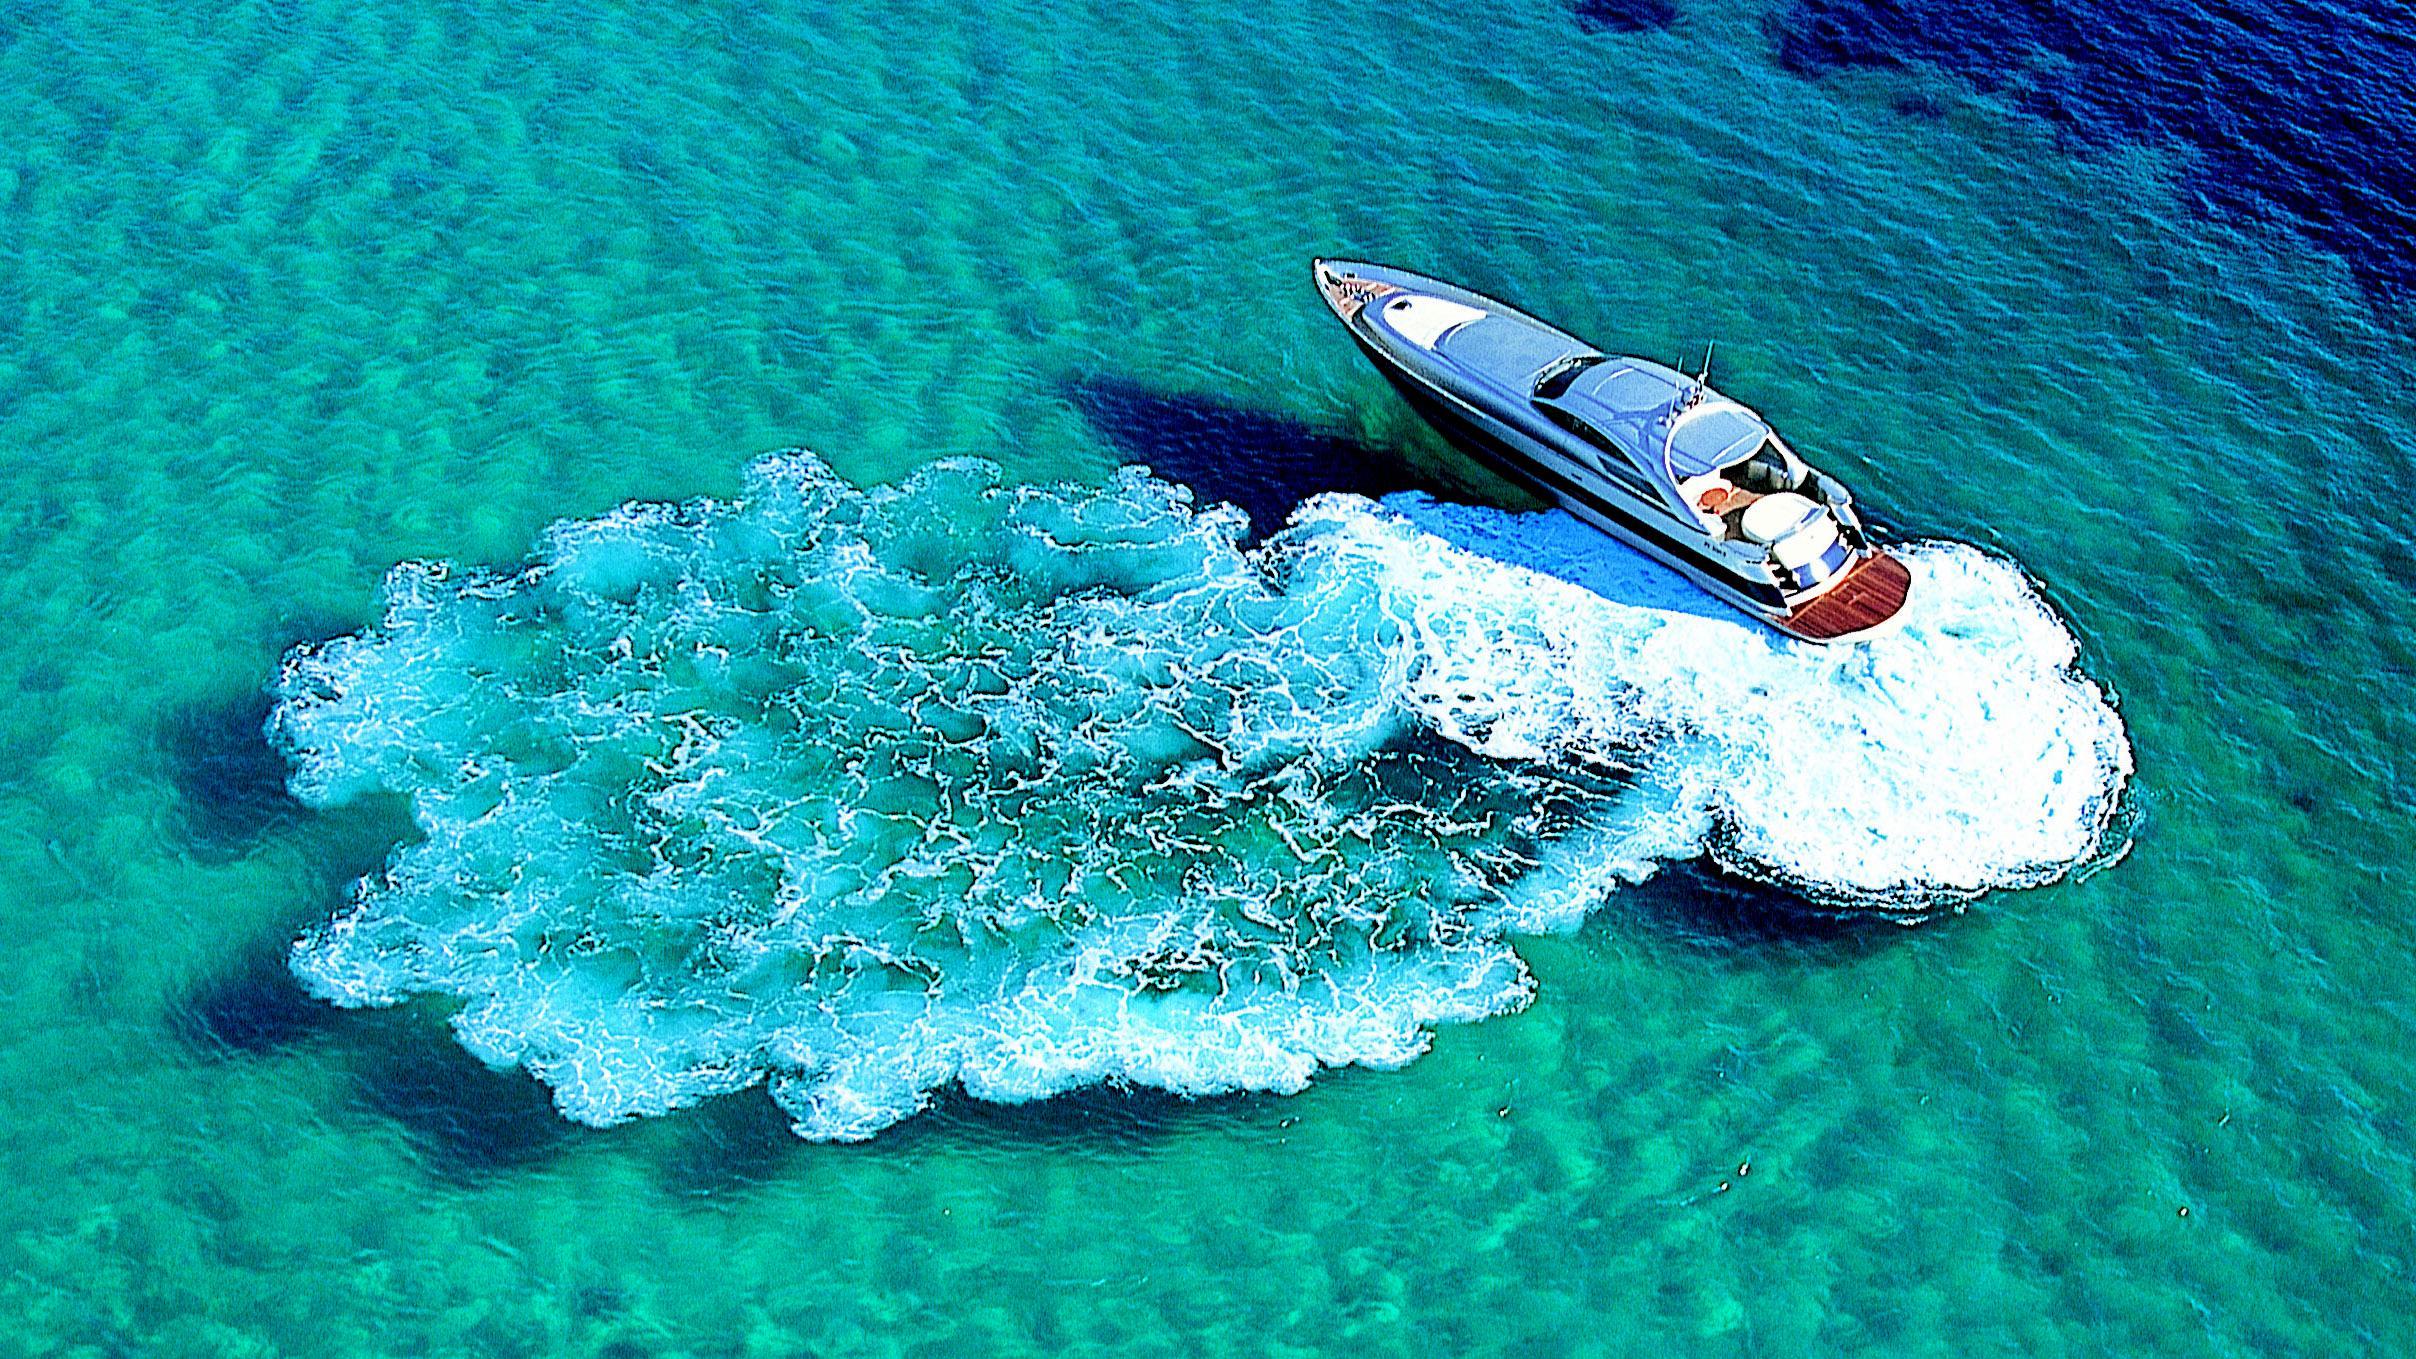 anouschka-en-ronny-8-motor-yacht-pershing-88-2004-27m-aerial